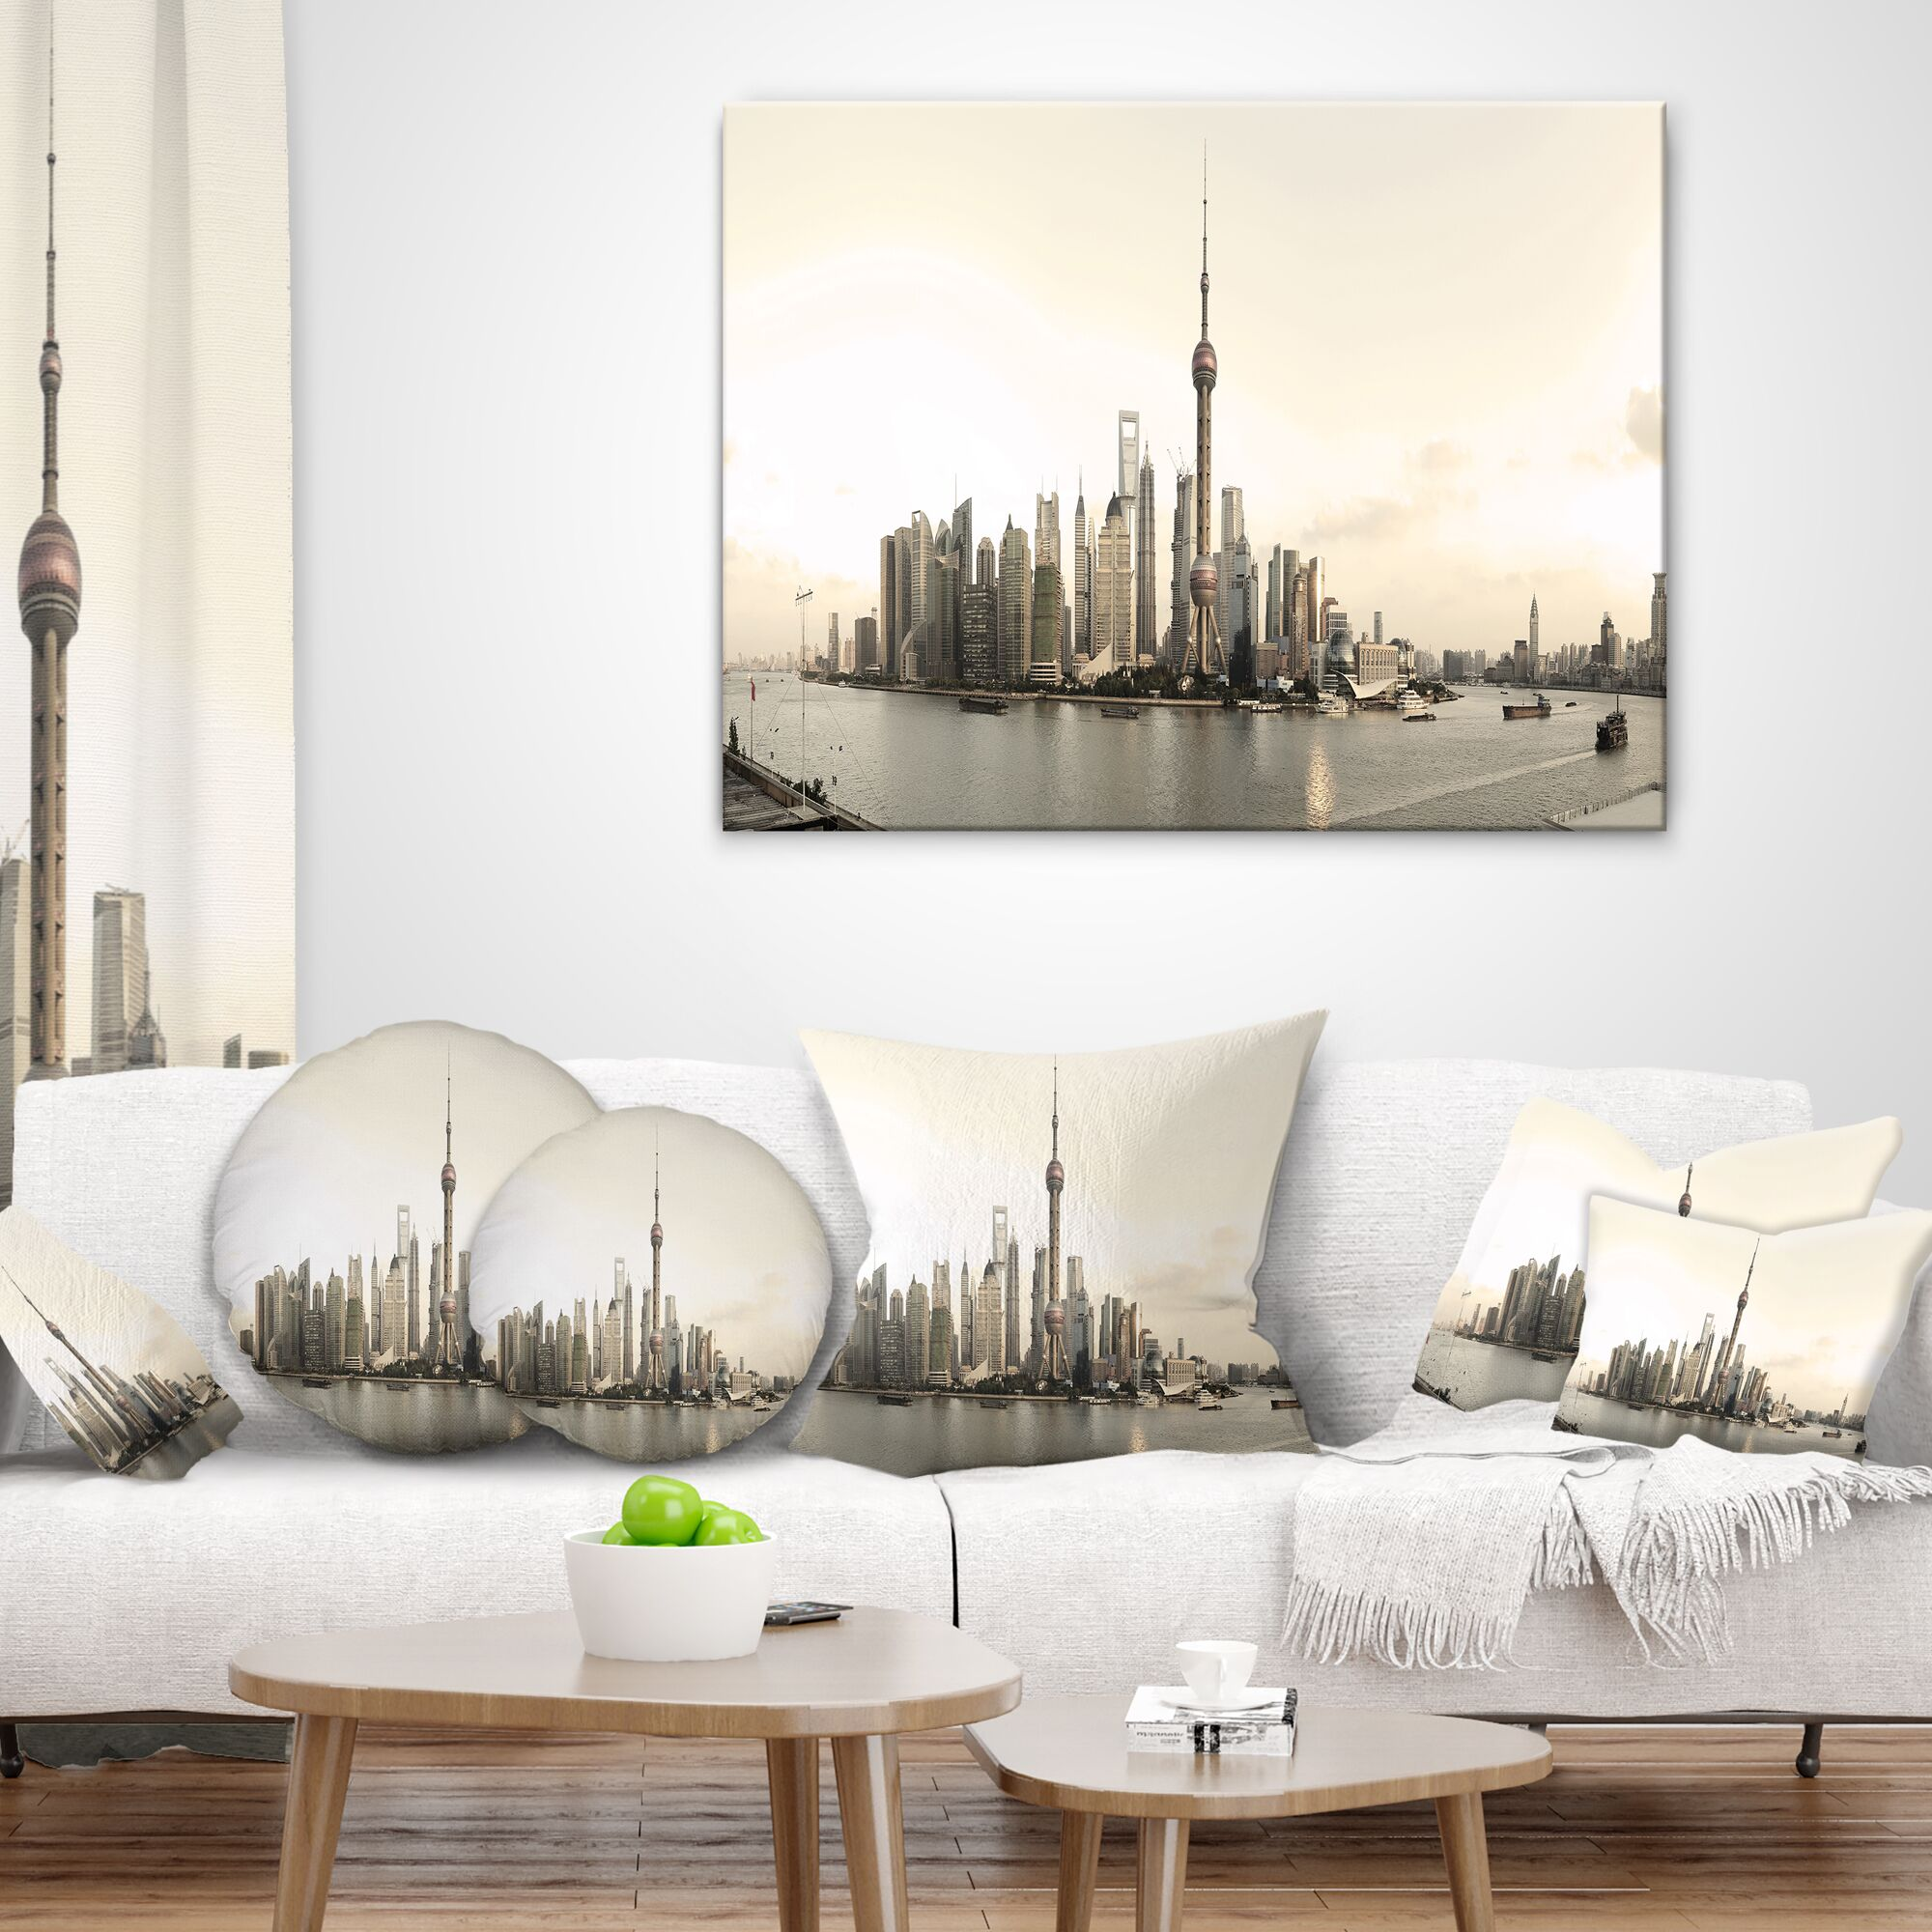 Cityscape Photo Shanghai s Architecture Lumbar Pillow